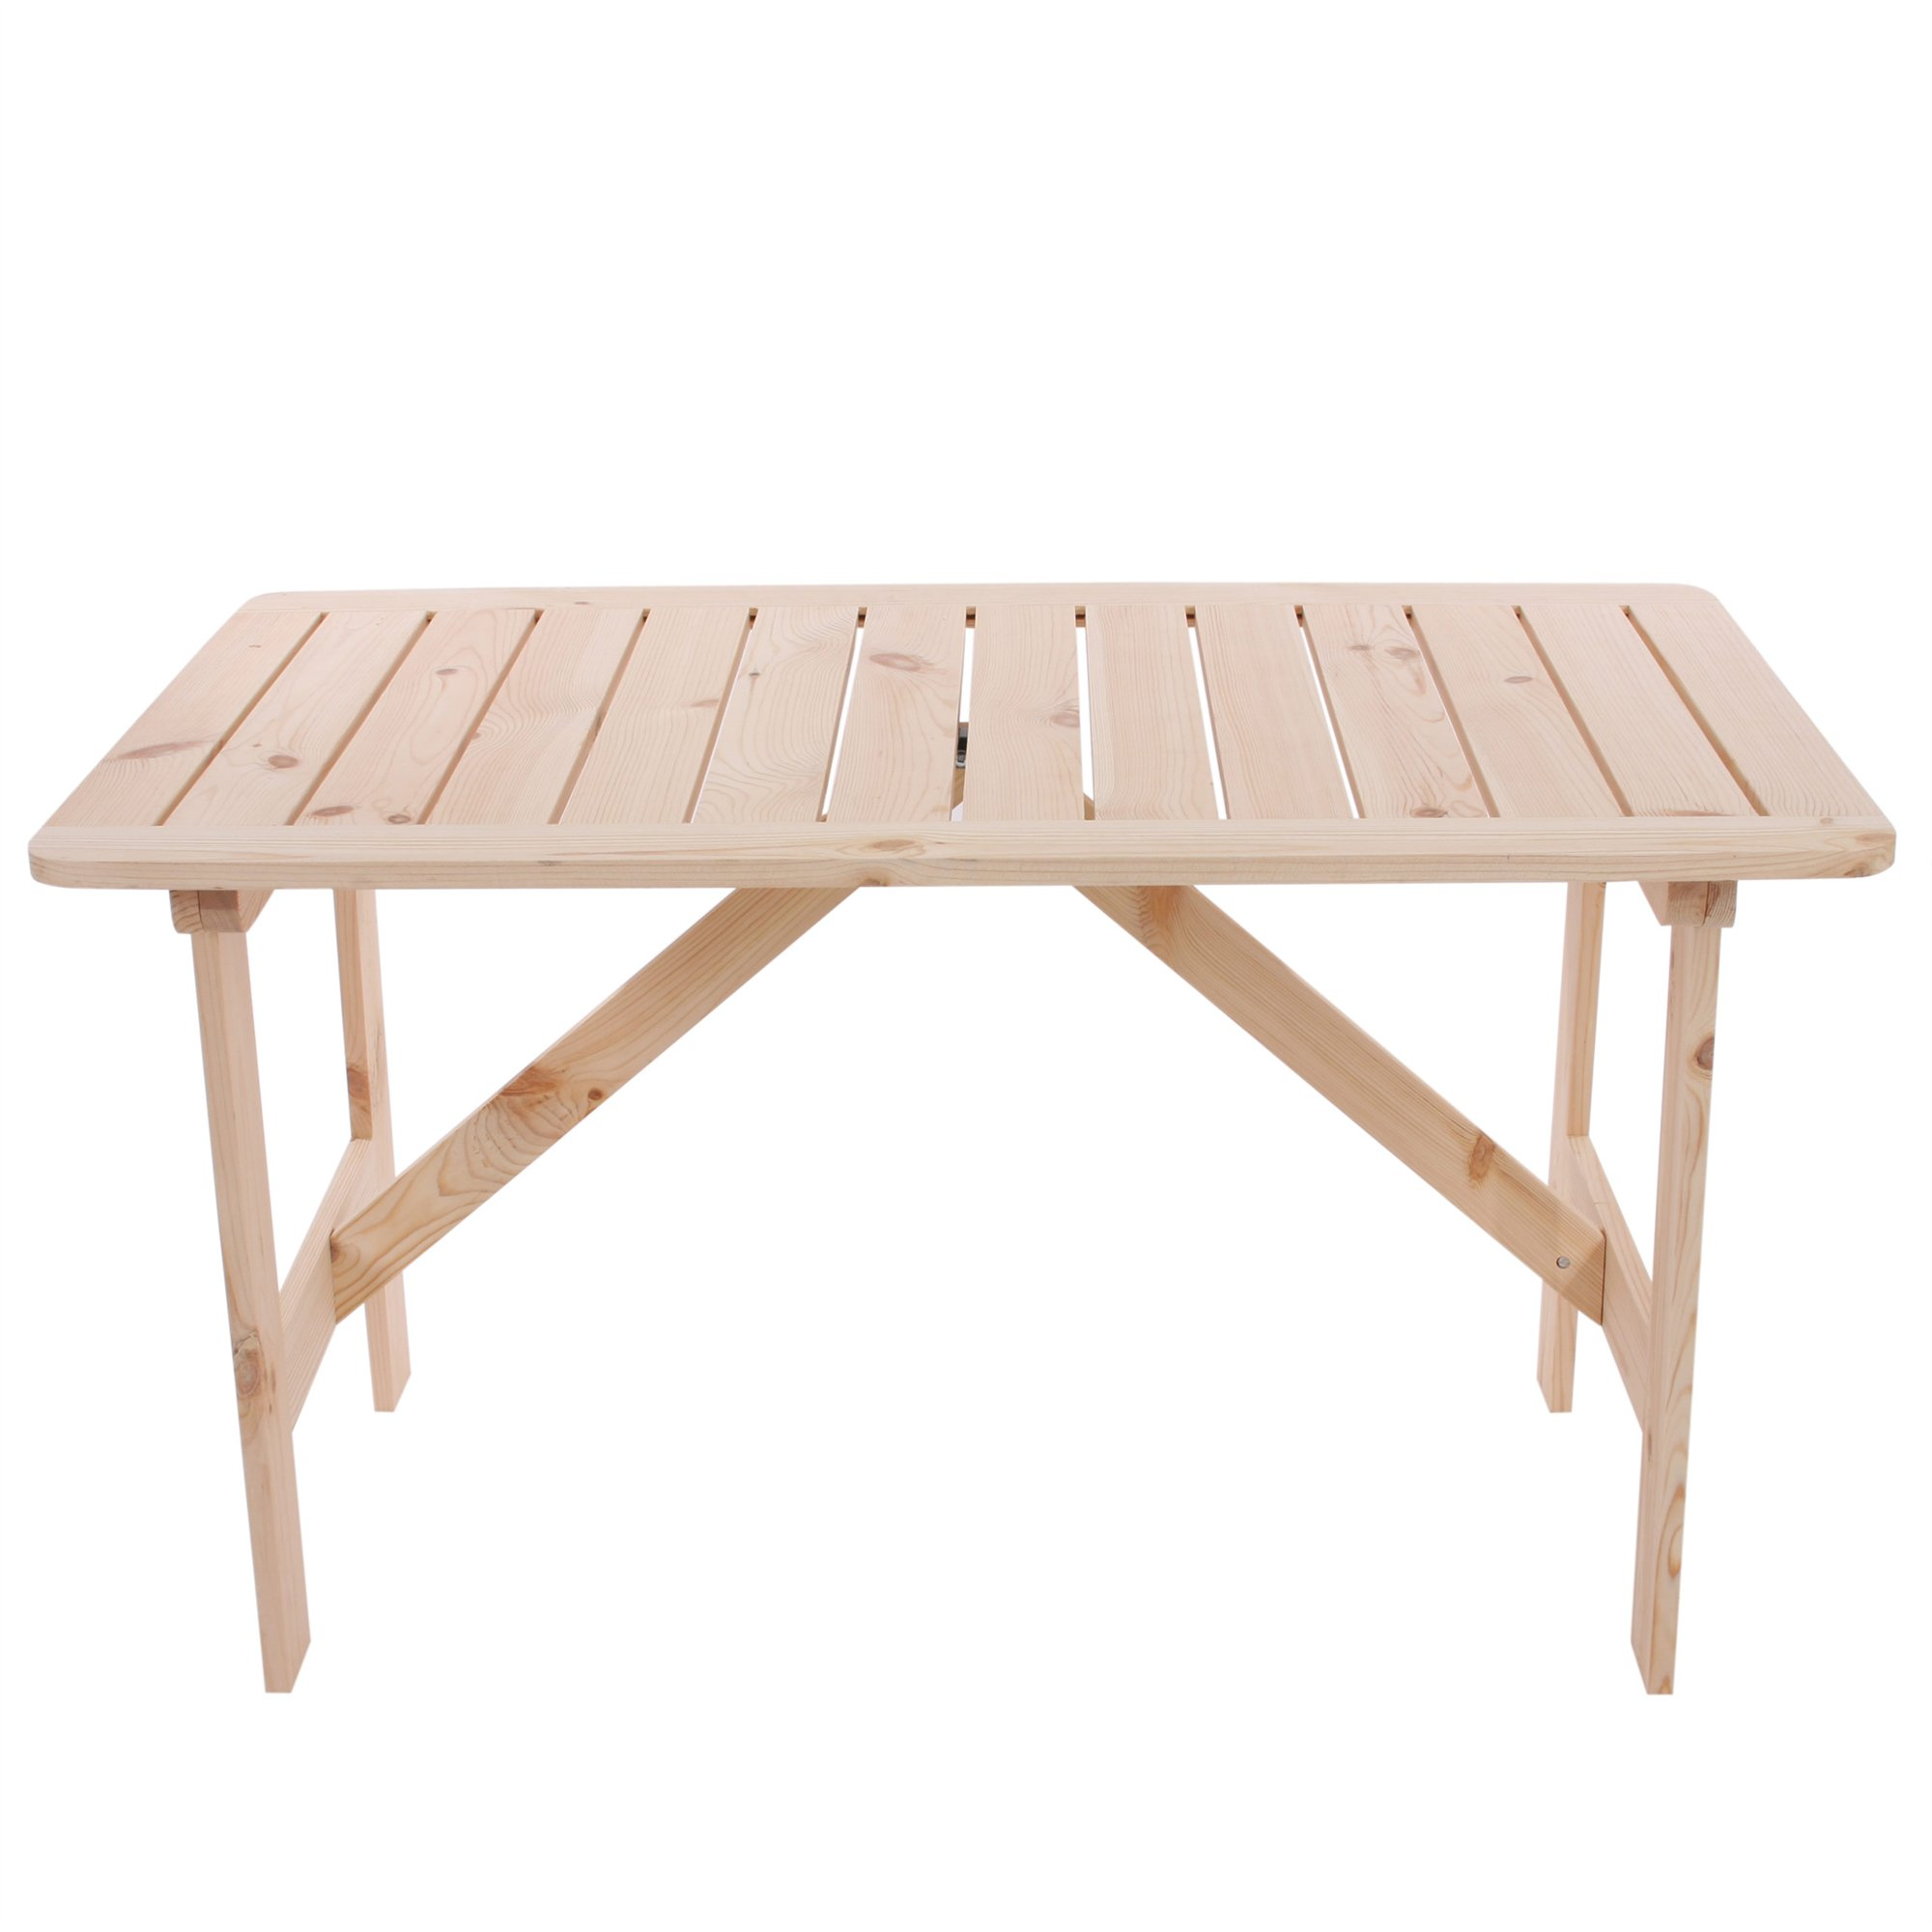 Mesa de jard n o terraza copenhaguen en madera 130 x 80 - Mesas de madera de jardin ...